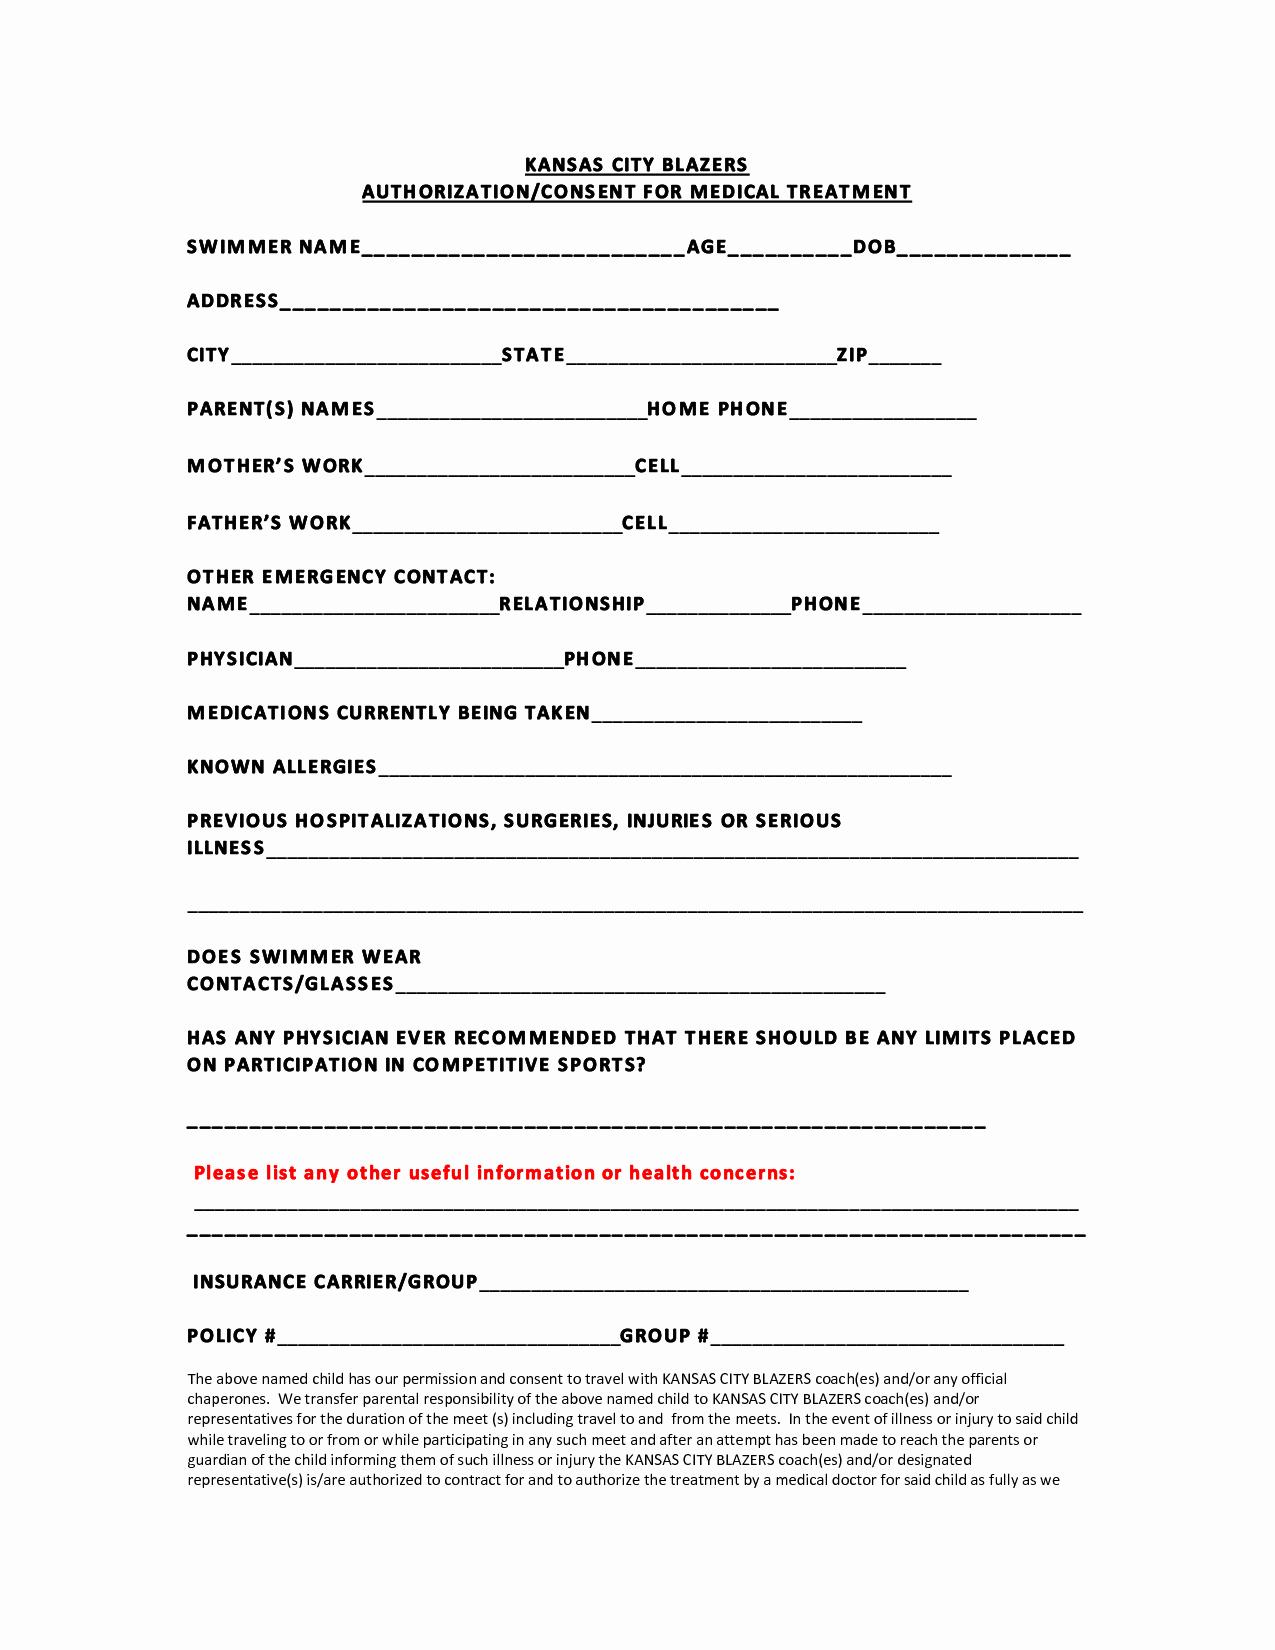 Medical Release Information form Template